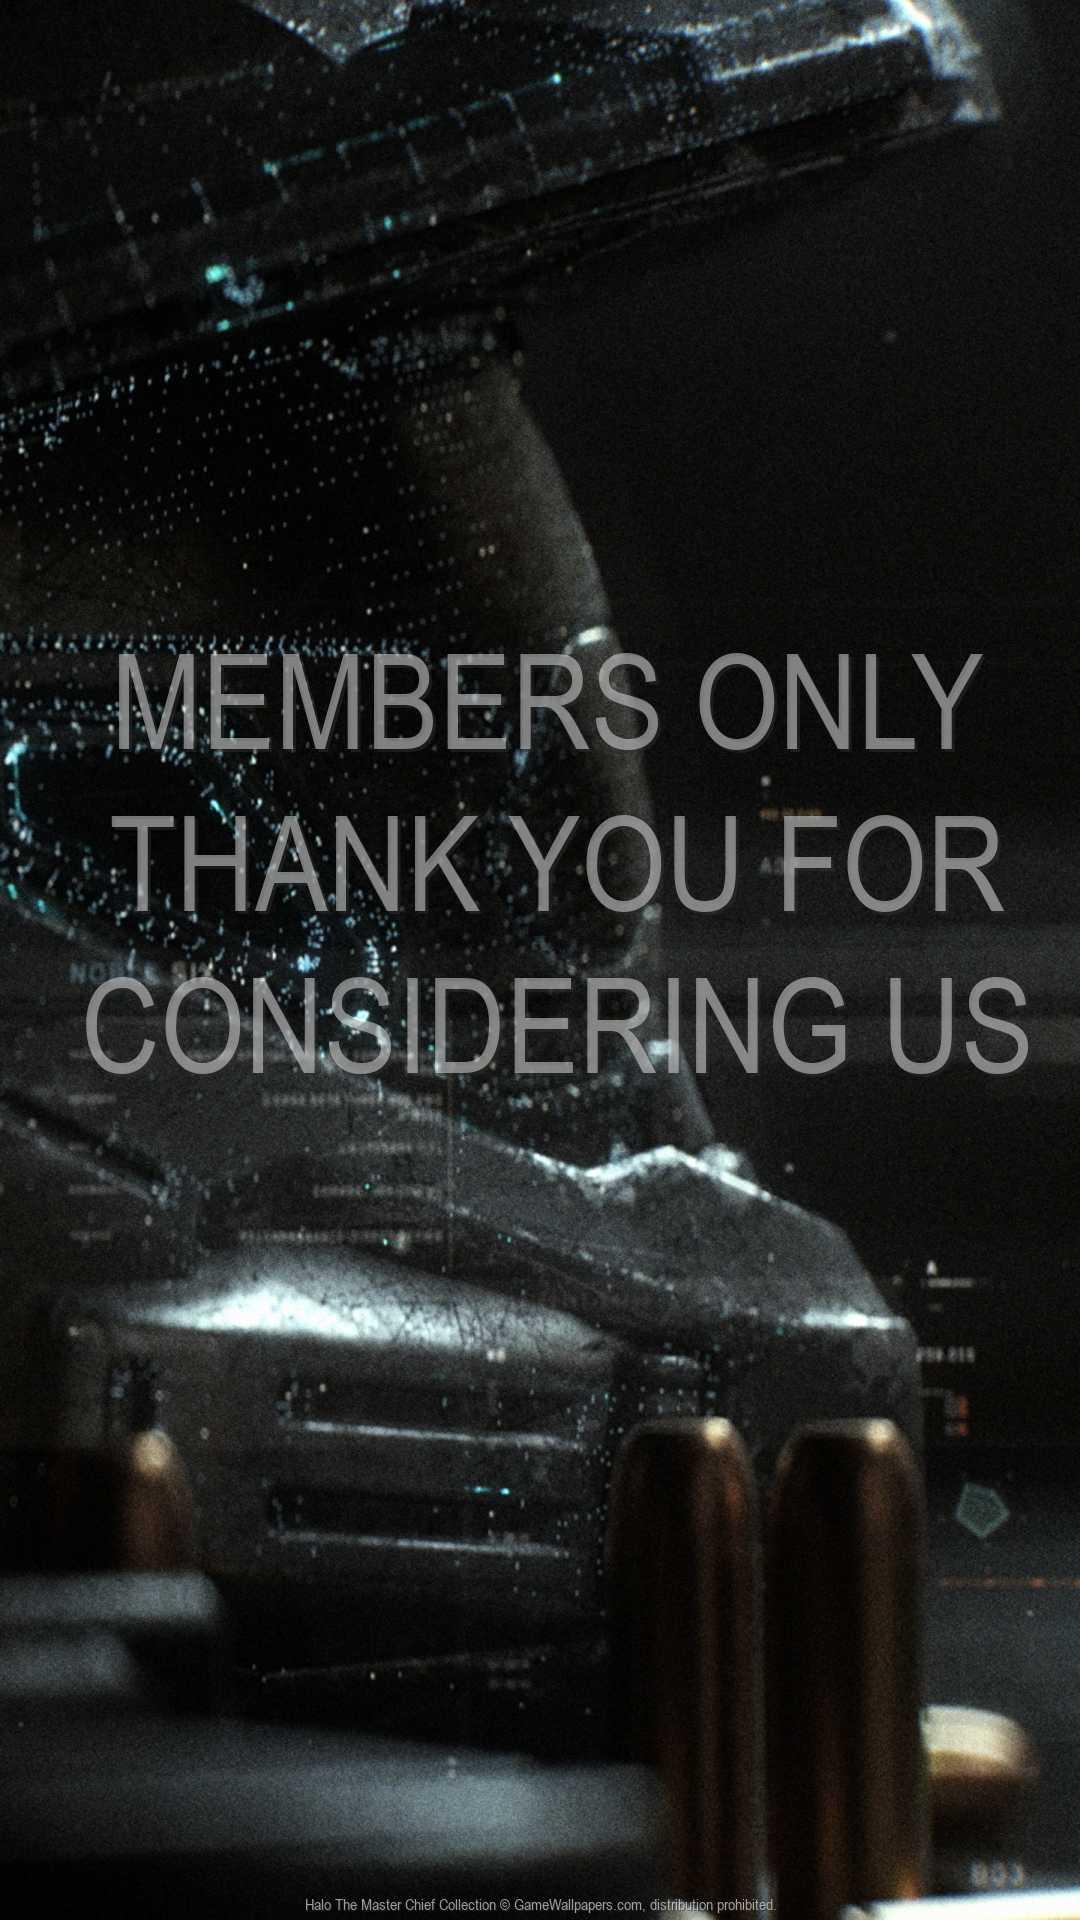 Halo: The Master Chief Collection 1080p Vertical Handy Hintergrundbild 01